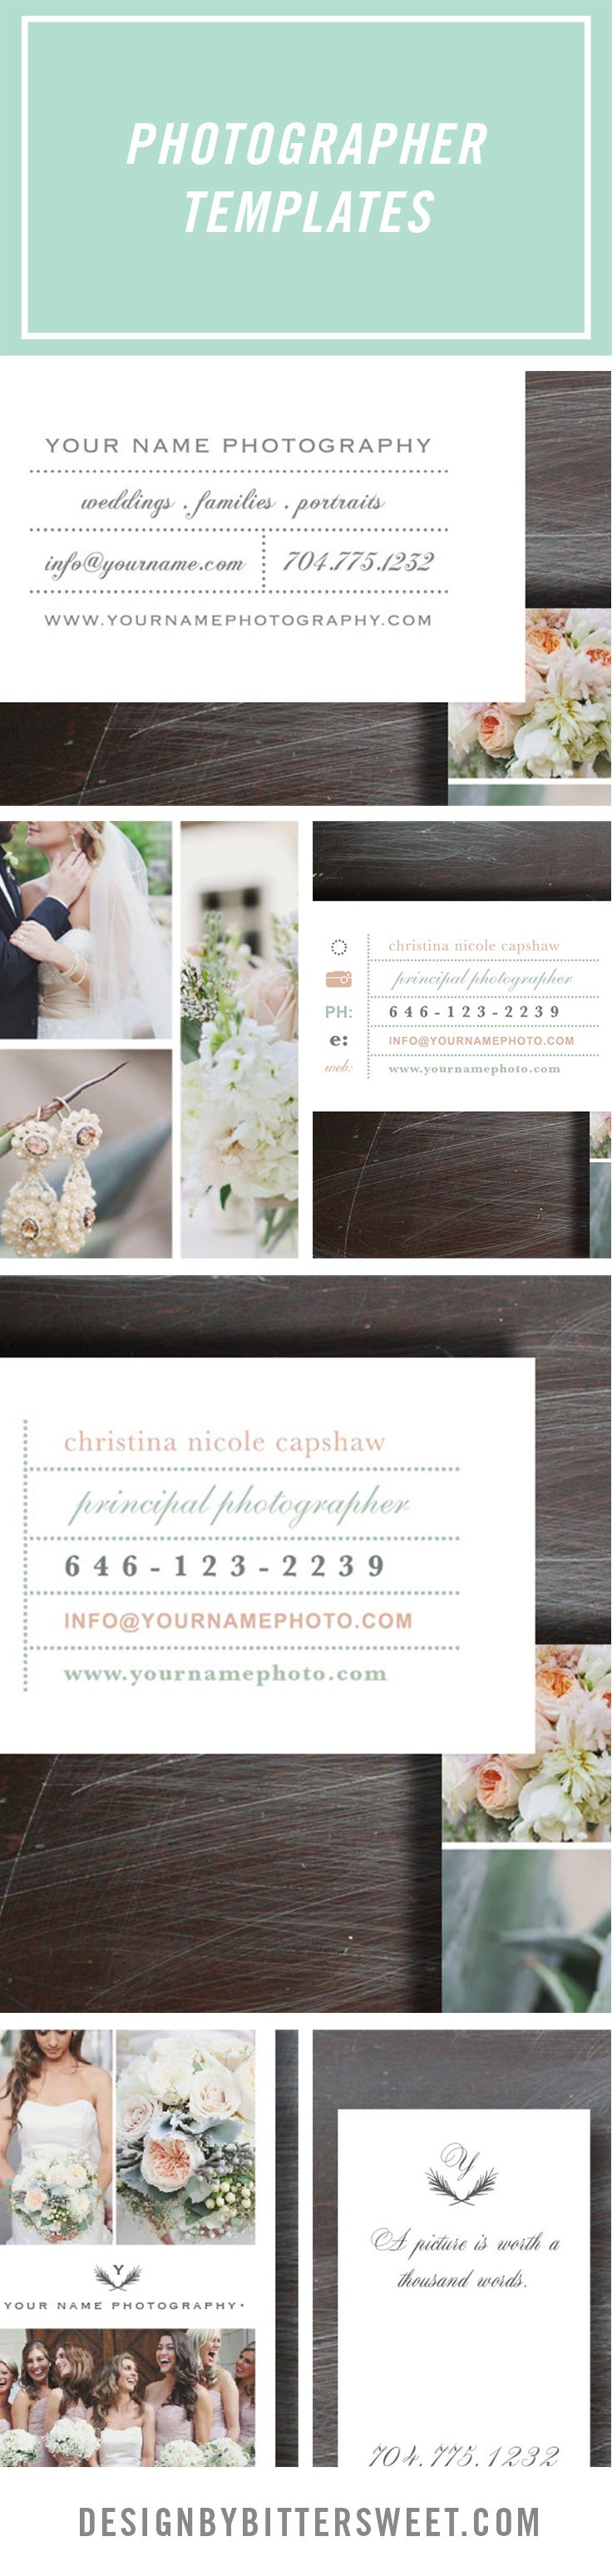 card templates for wedding invitation%0A Business cards for photographers  Wedding photography business card   Business card template